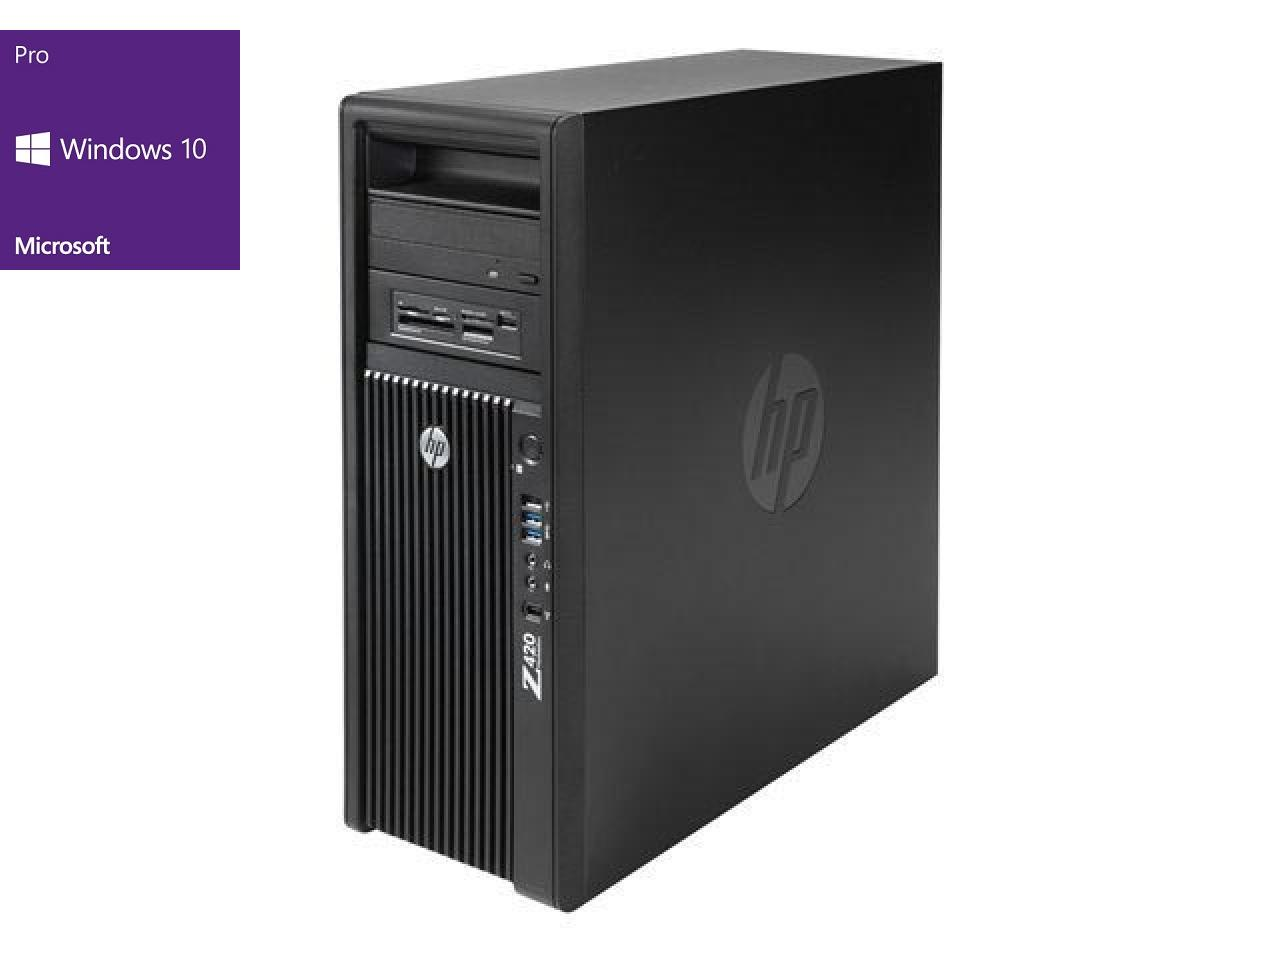 Hewlett Packard Z420 T